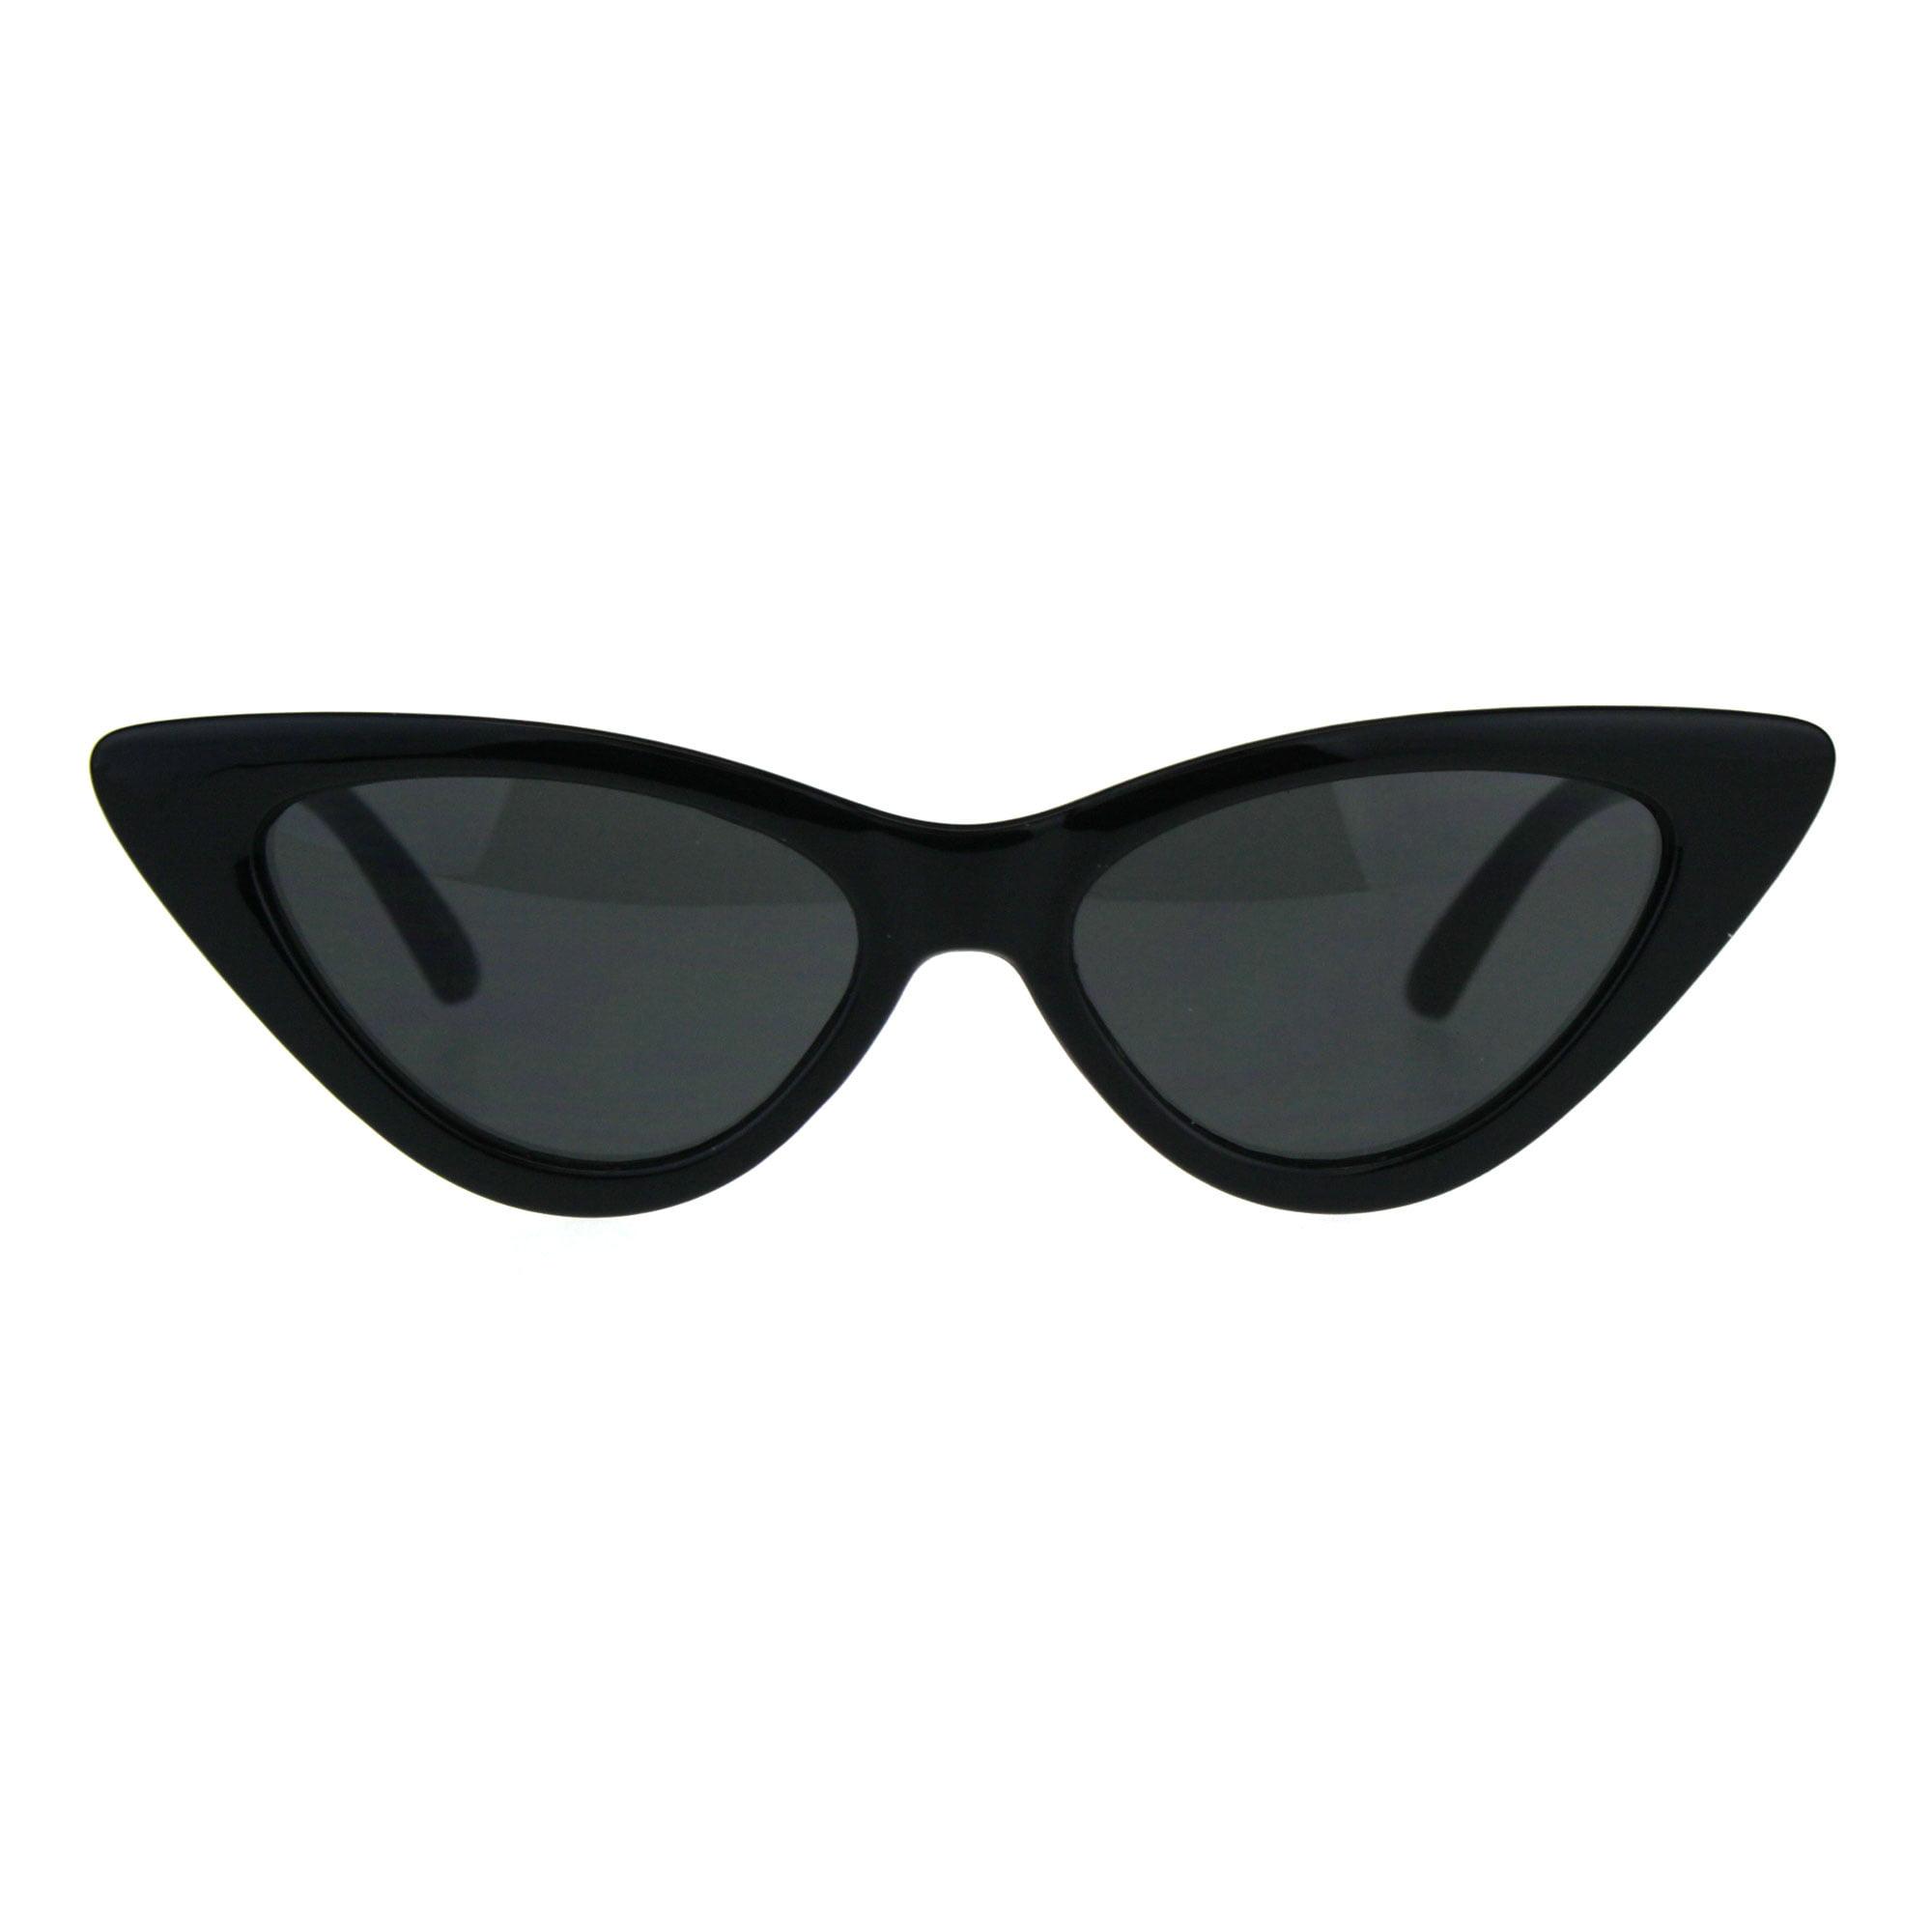 9c326fdb3f174 SA106 - Womens Classic Narrow Cat Eye Gothic Plastic Sunglasses All Black -  Walmart.com